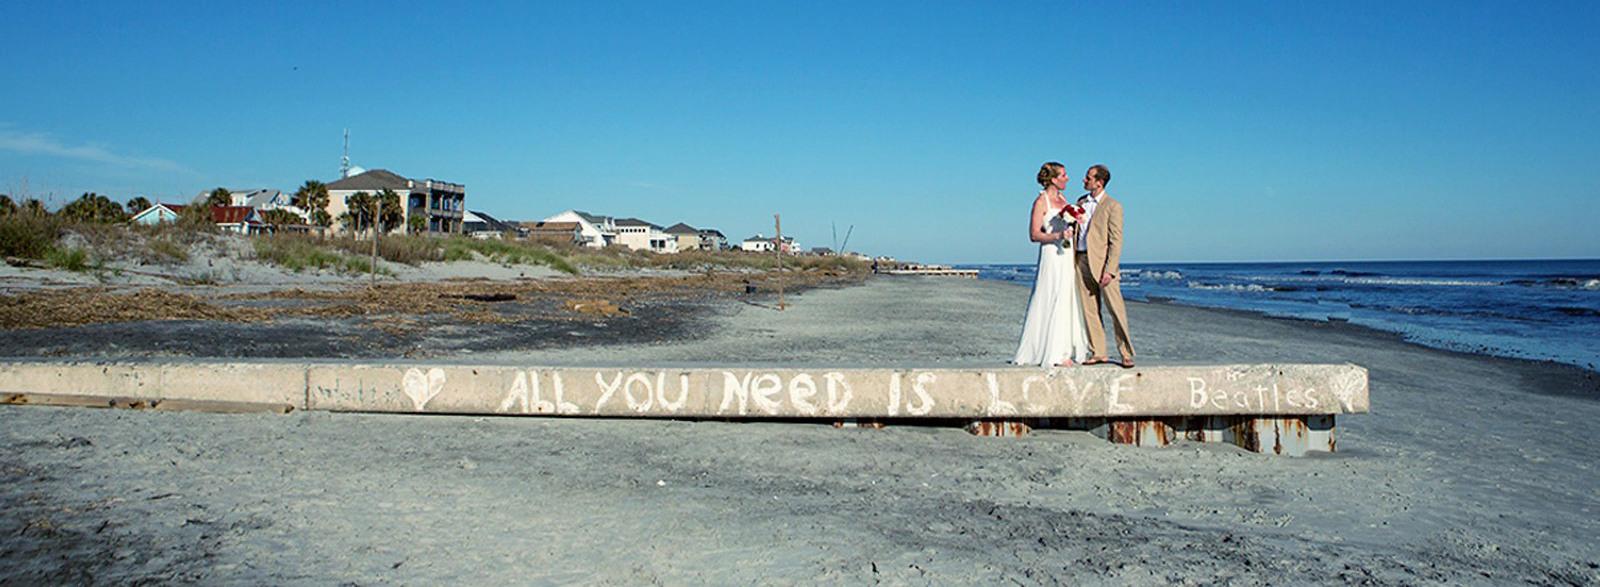 Weddings, Venues & More In Folly Beach, SC